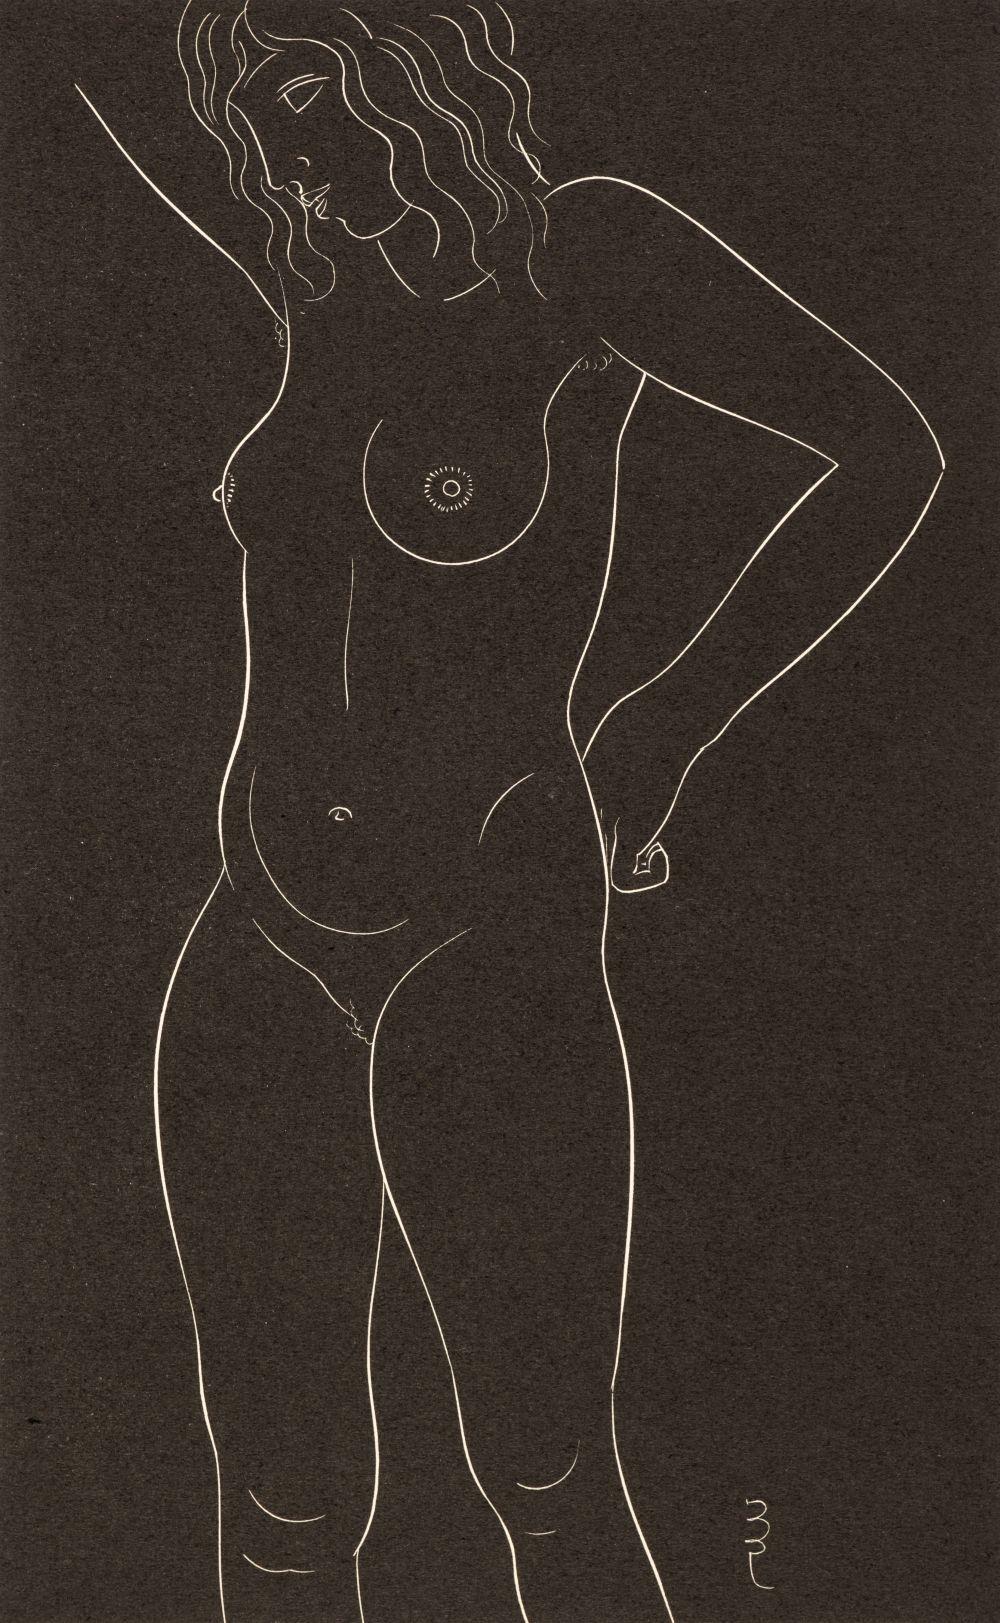 * Gill (Eric, 1882-1940). Twenty-Five Nudes: Six Plates, 1937